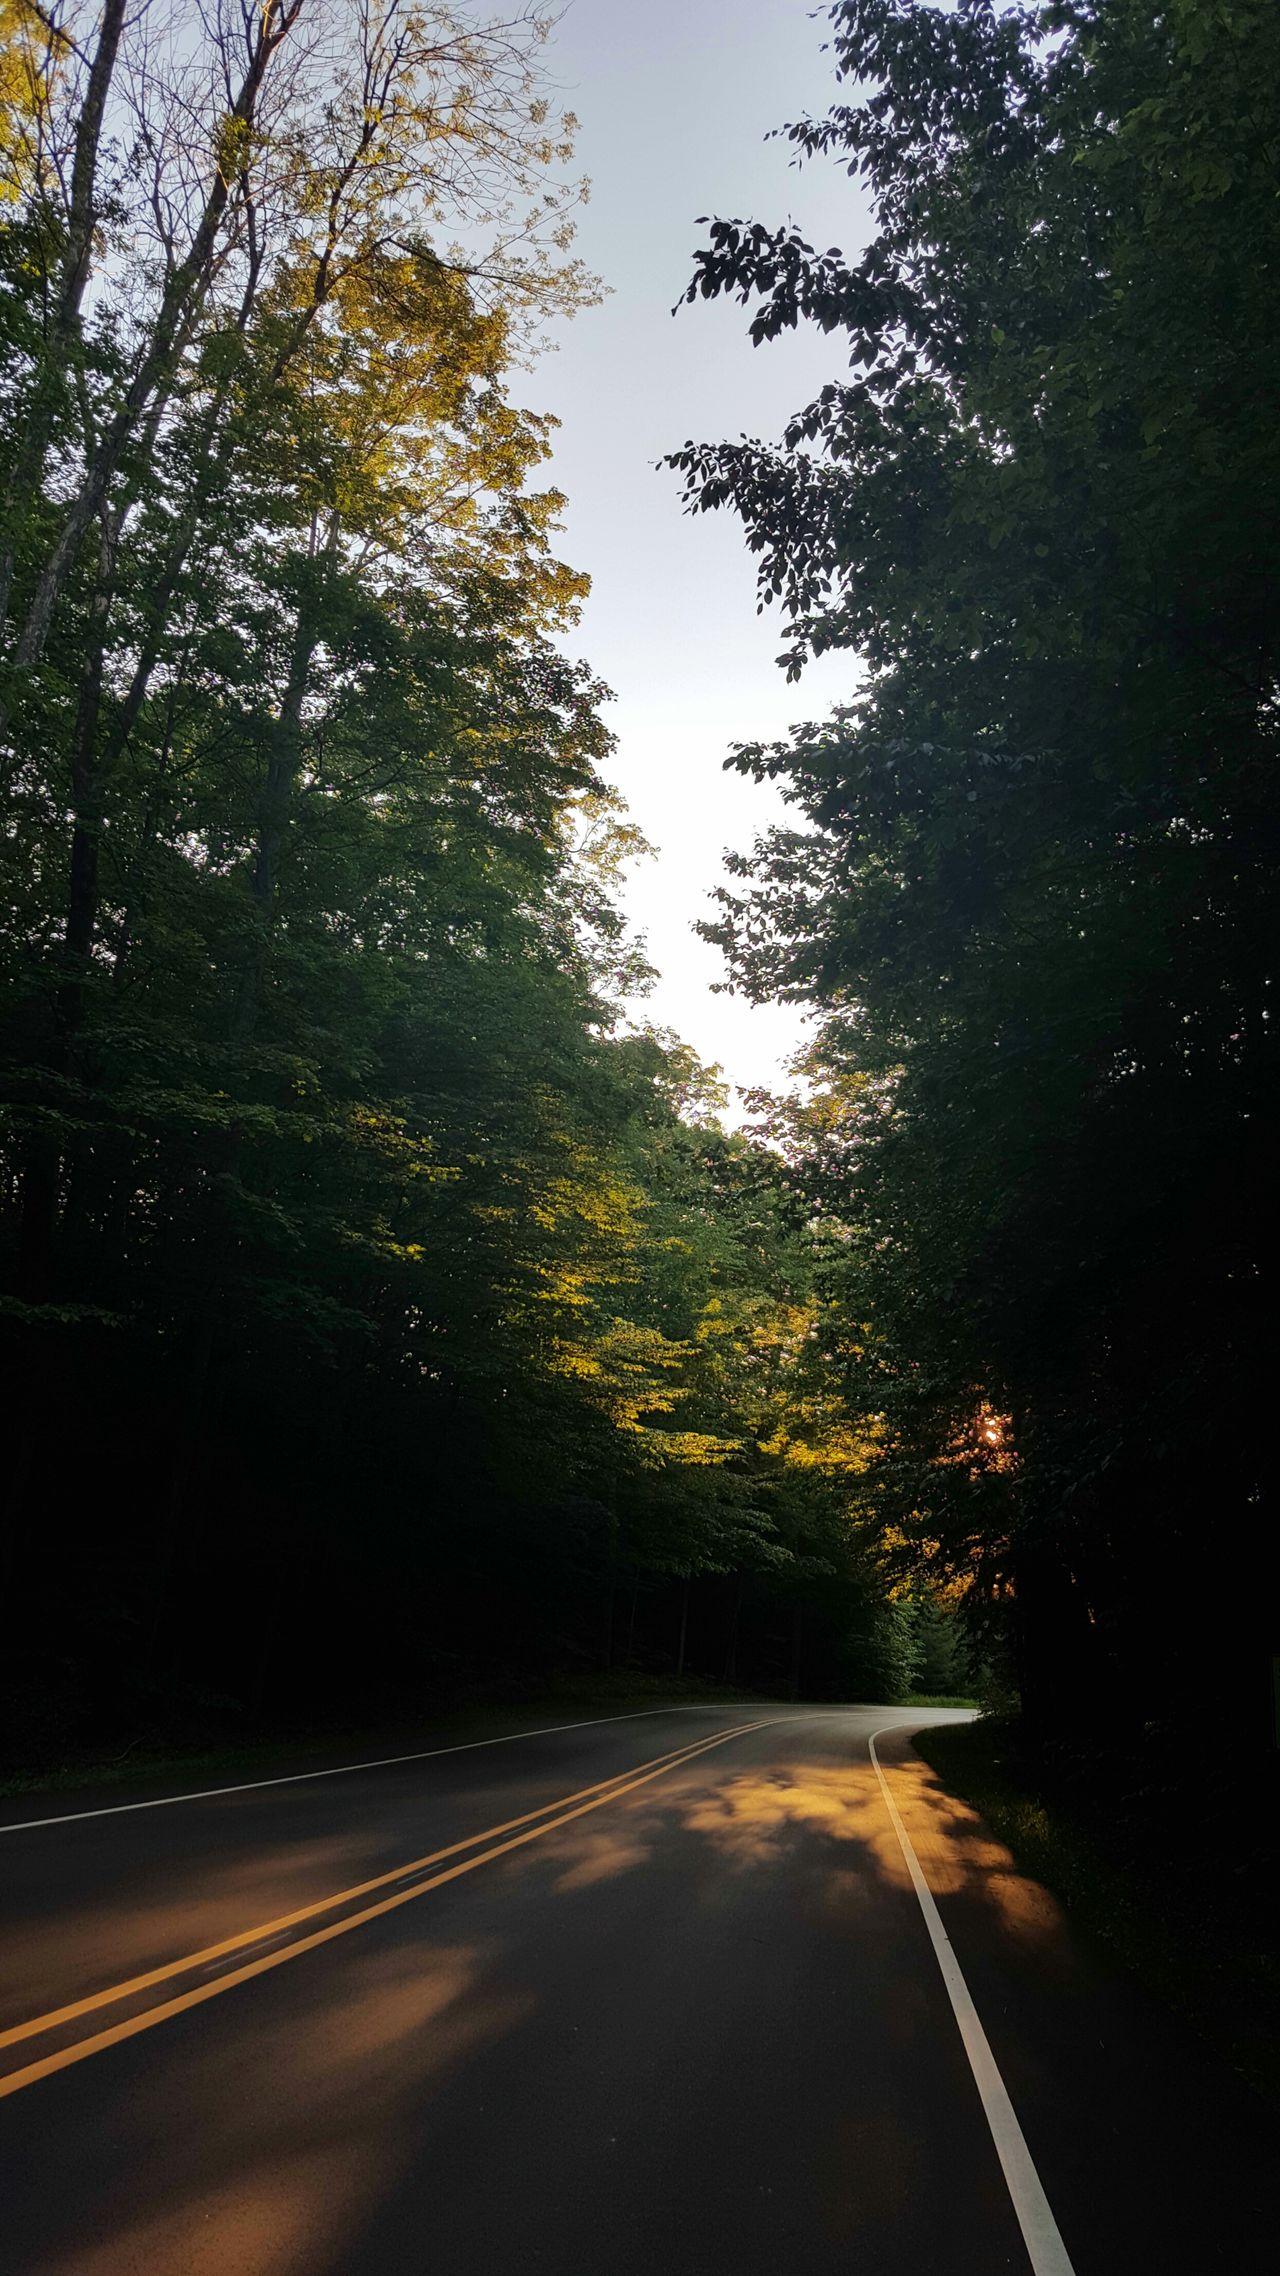 Scenic Drive Mein Automoment Road Forest Sunlight Summer Non Urban Scene No People Sleeping Bear National Lakeshore Michigan